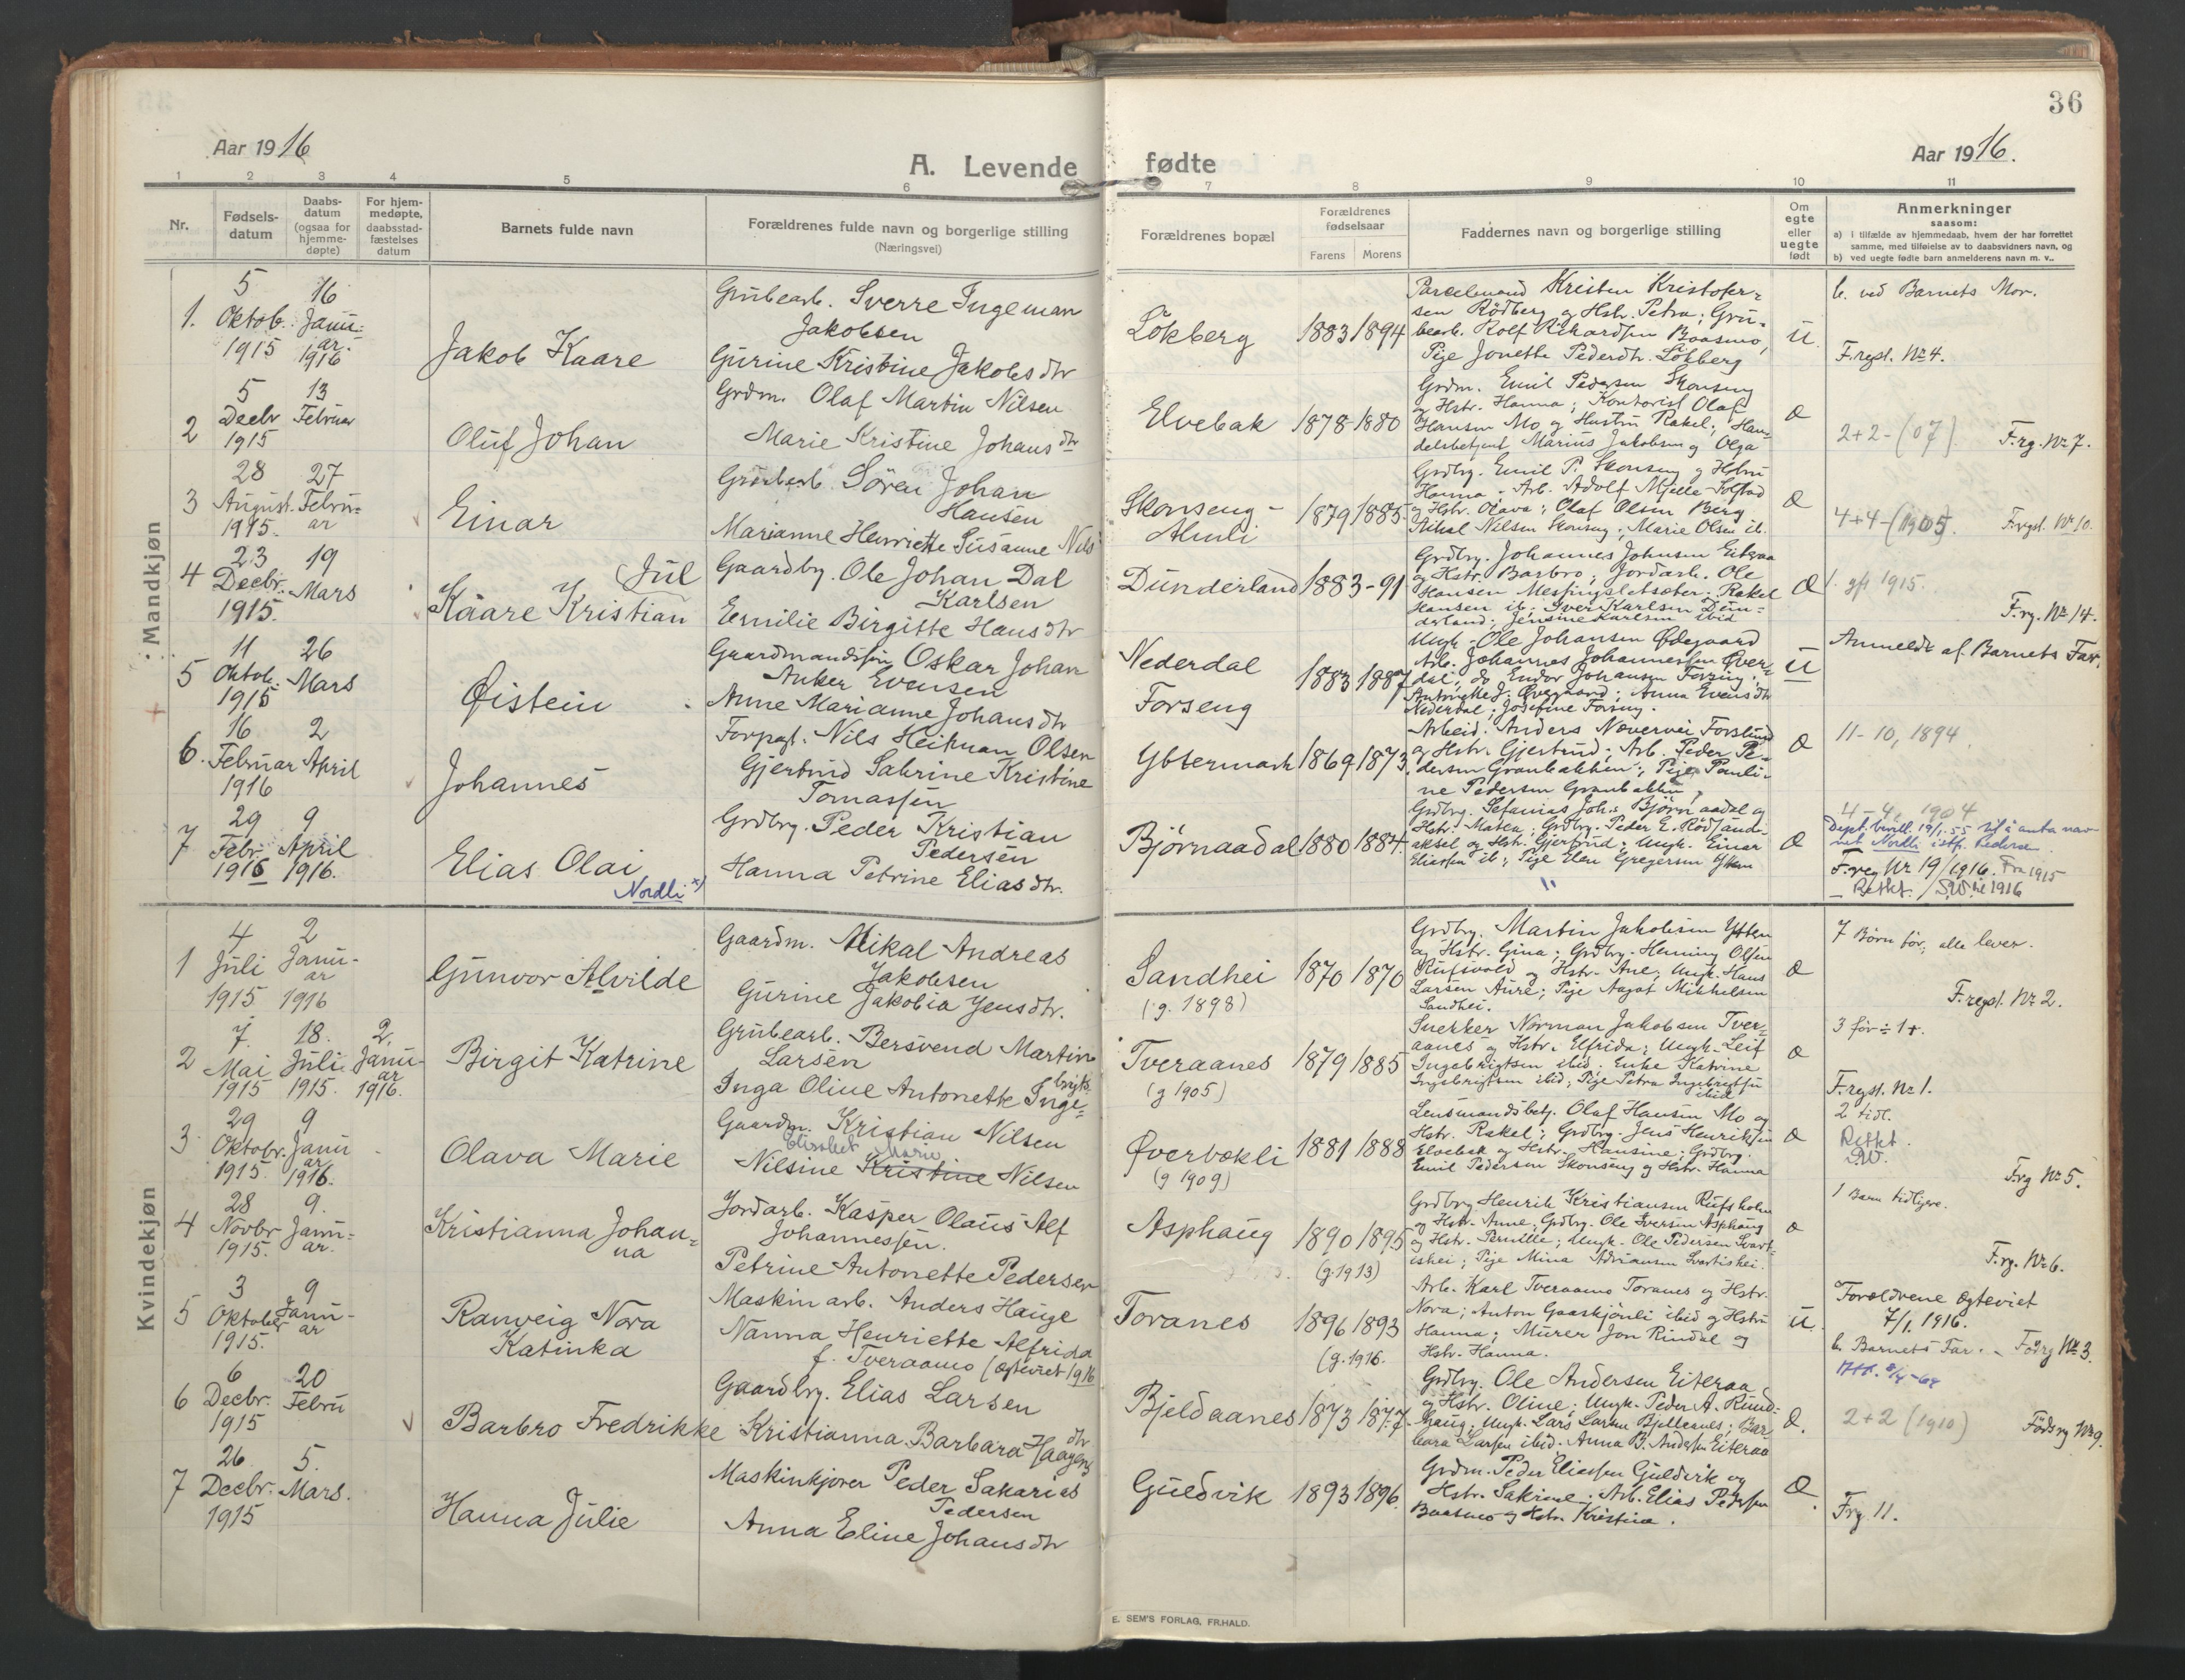 SAT, Ministerialprotokoller, klokkerbøker og fødselsregistre - Nordland, 827/L0404: Ministerialbok nr. 827A16, 1912-1925, s. 36